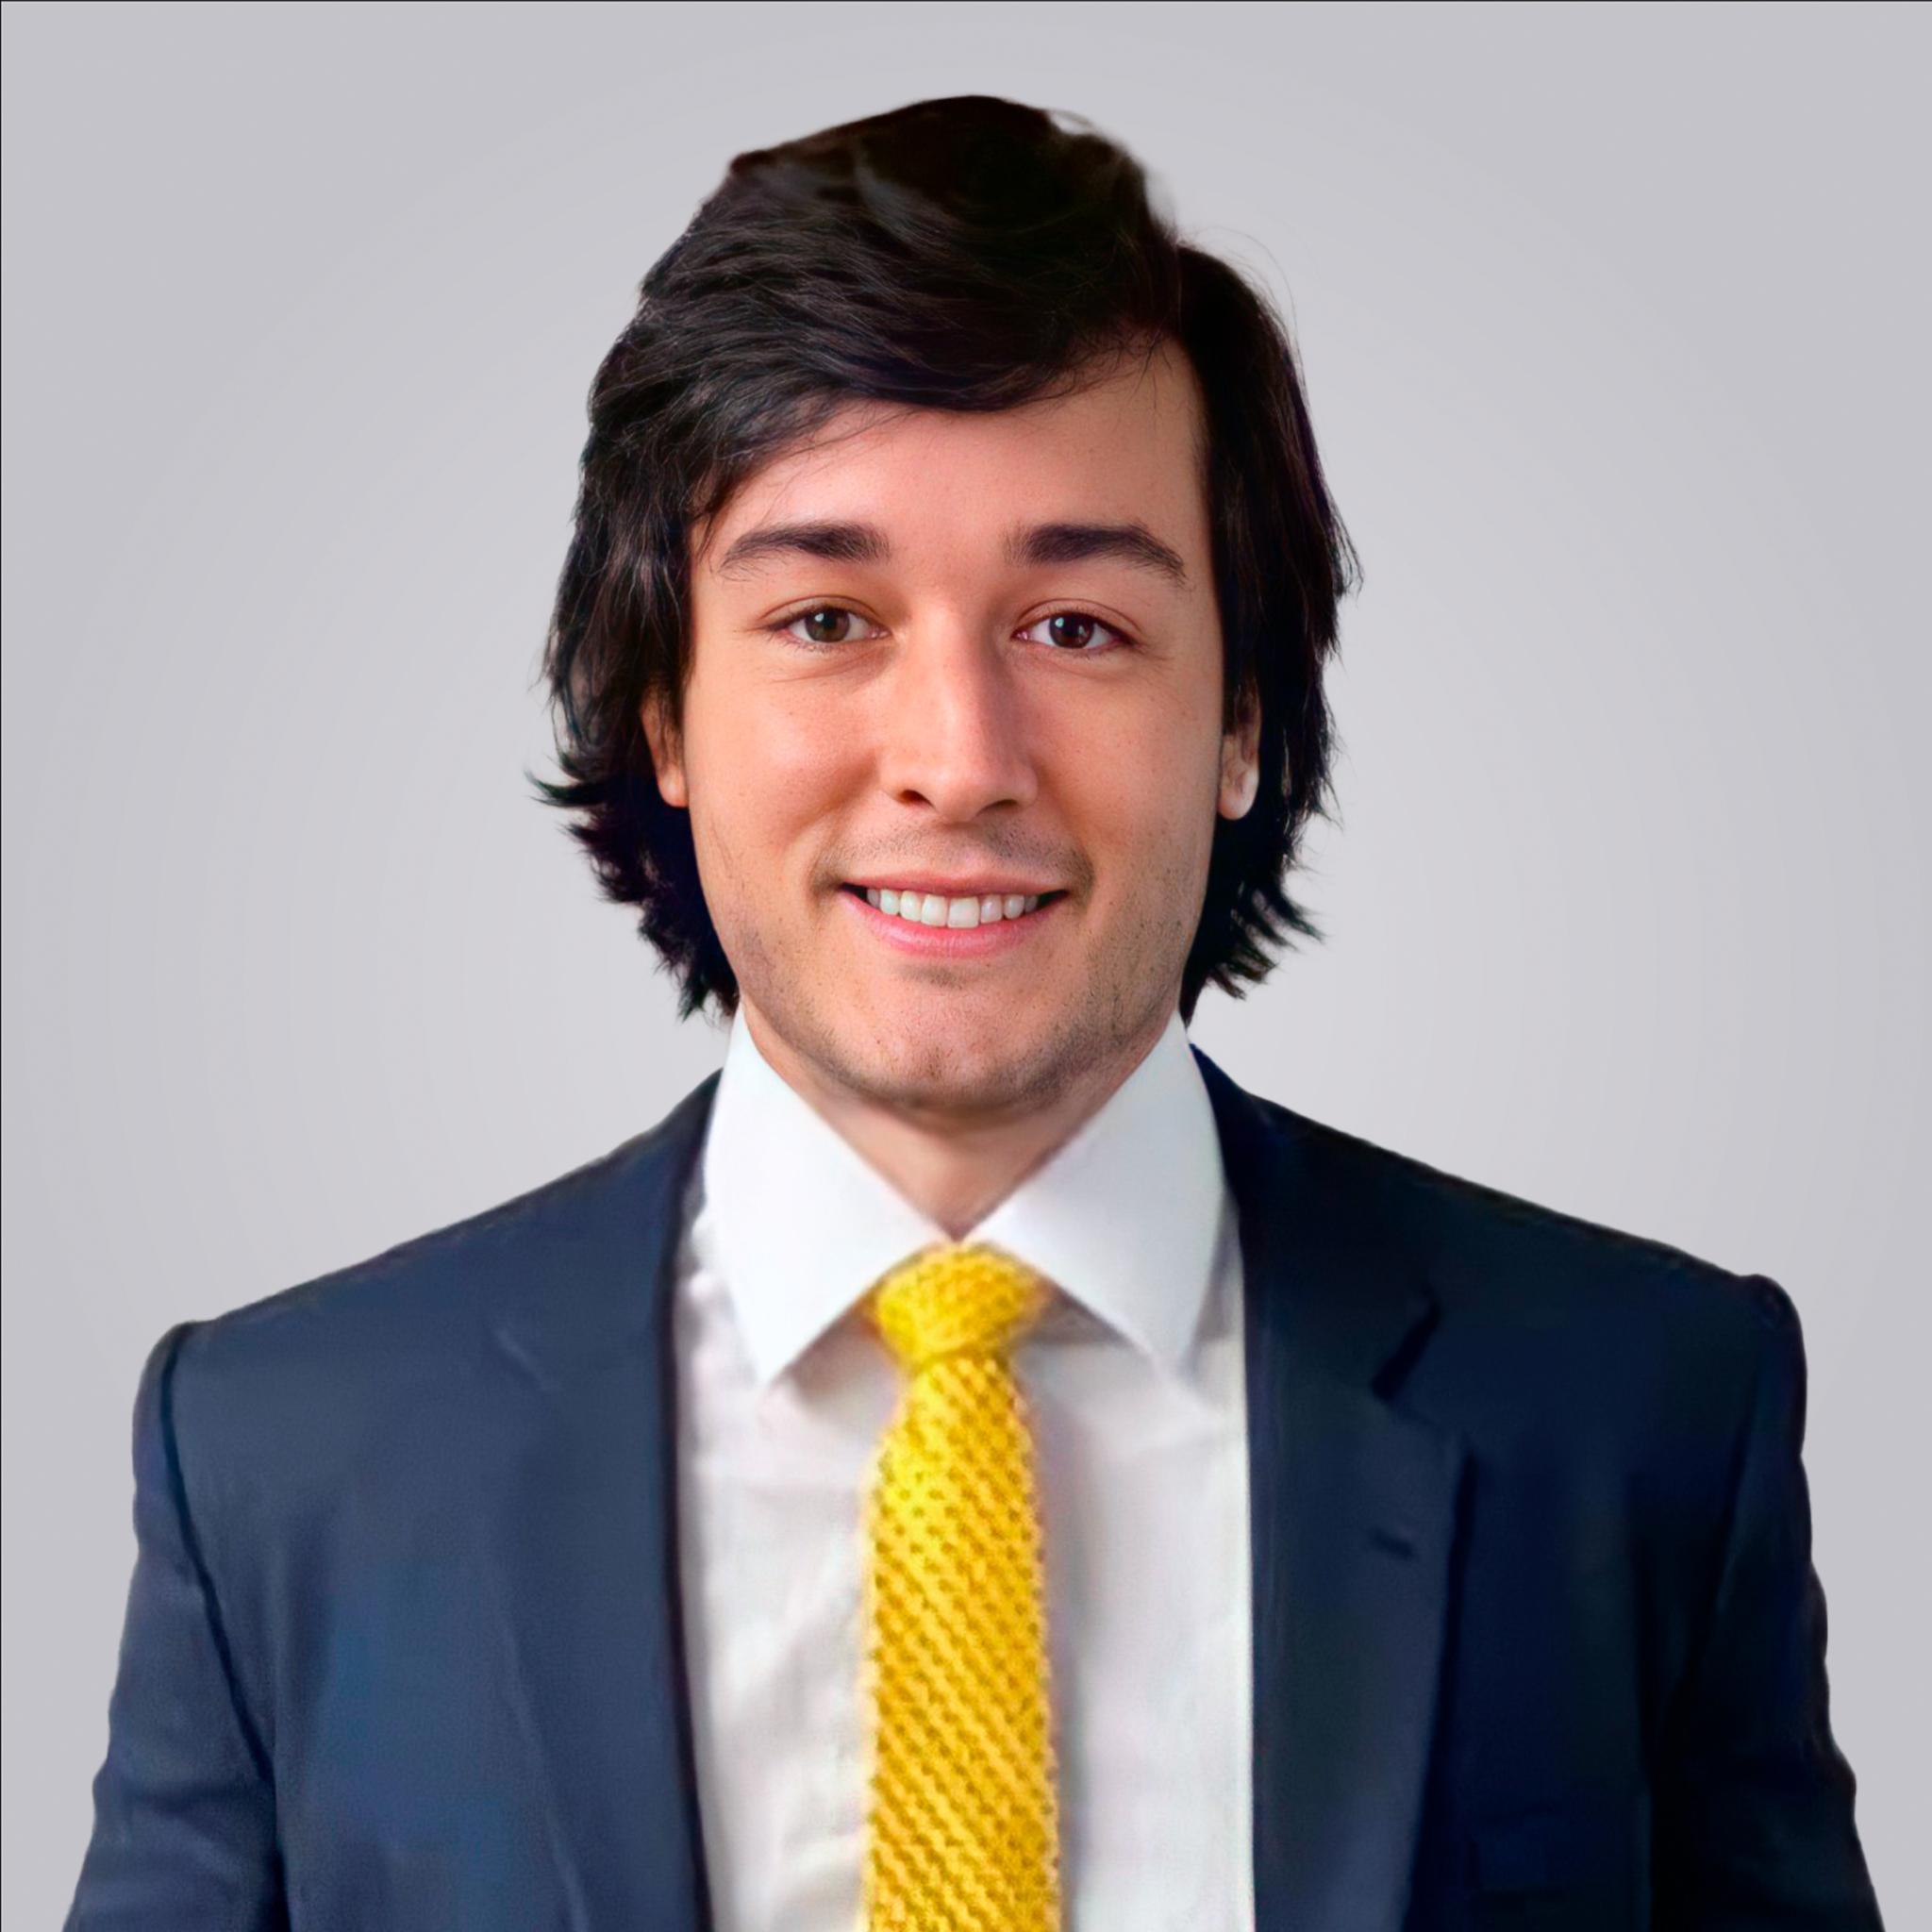 Pedro Lucena